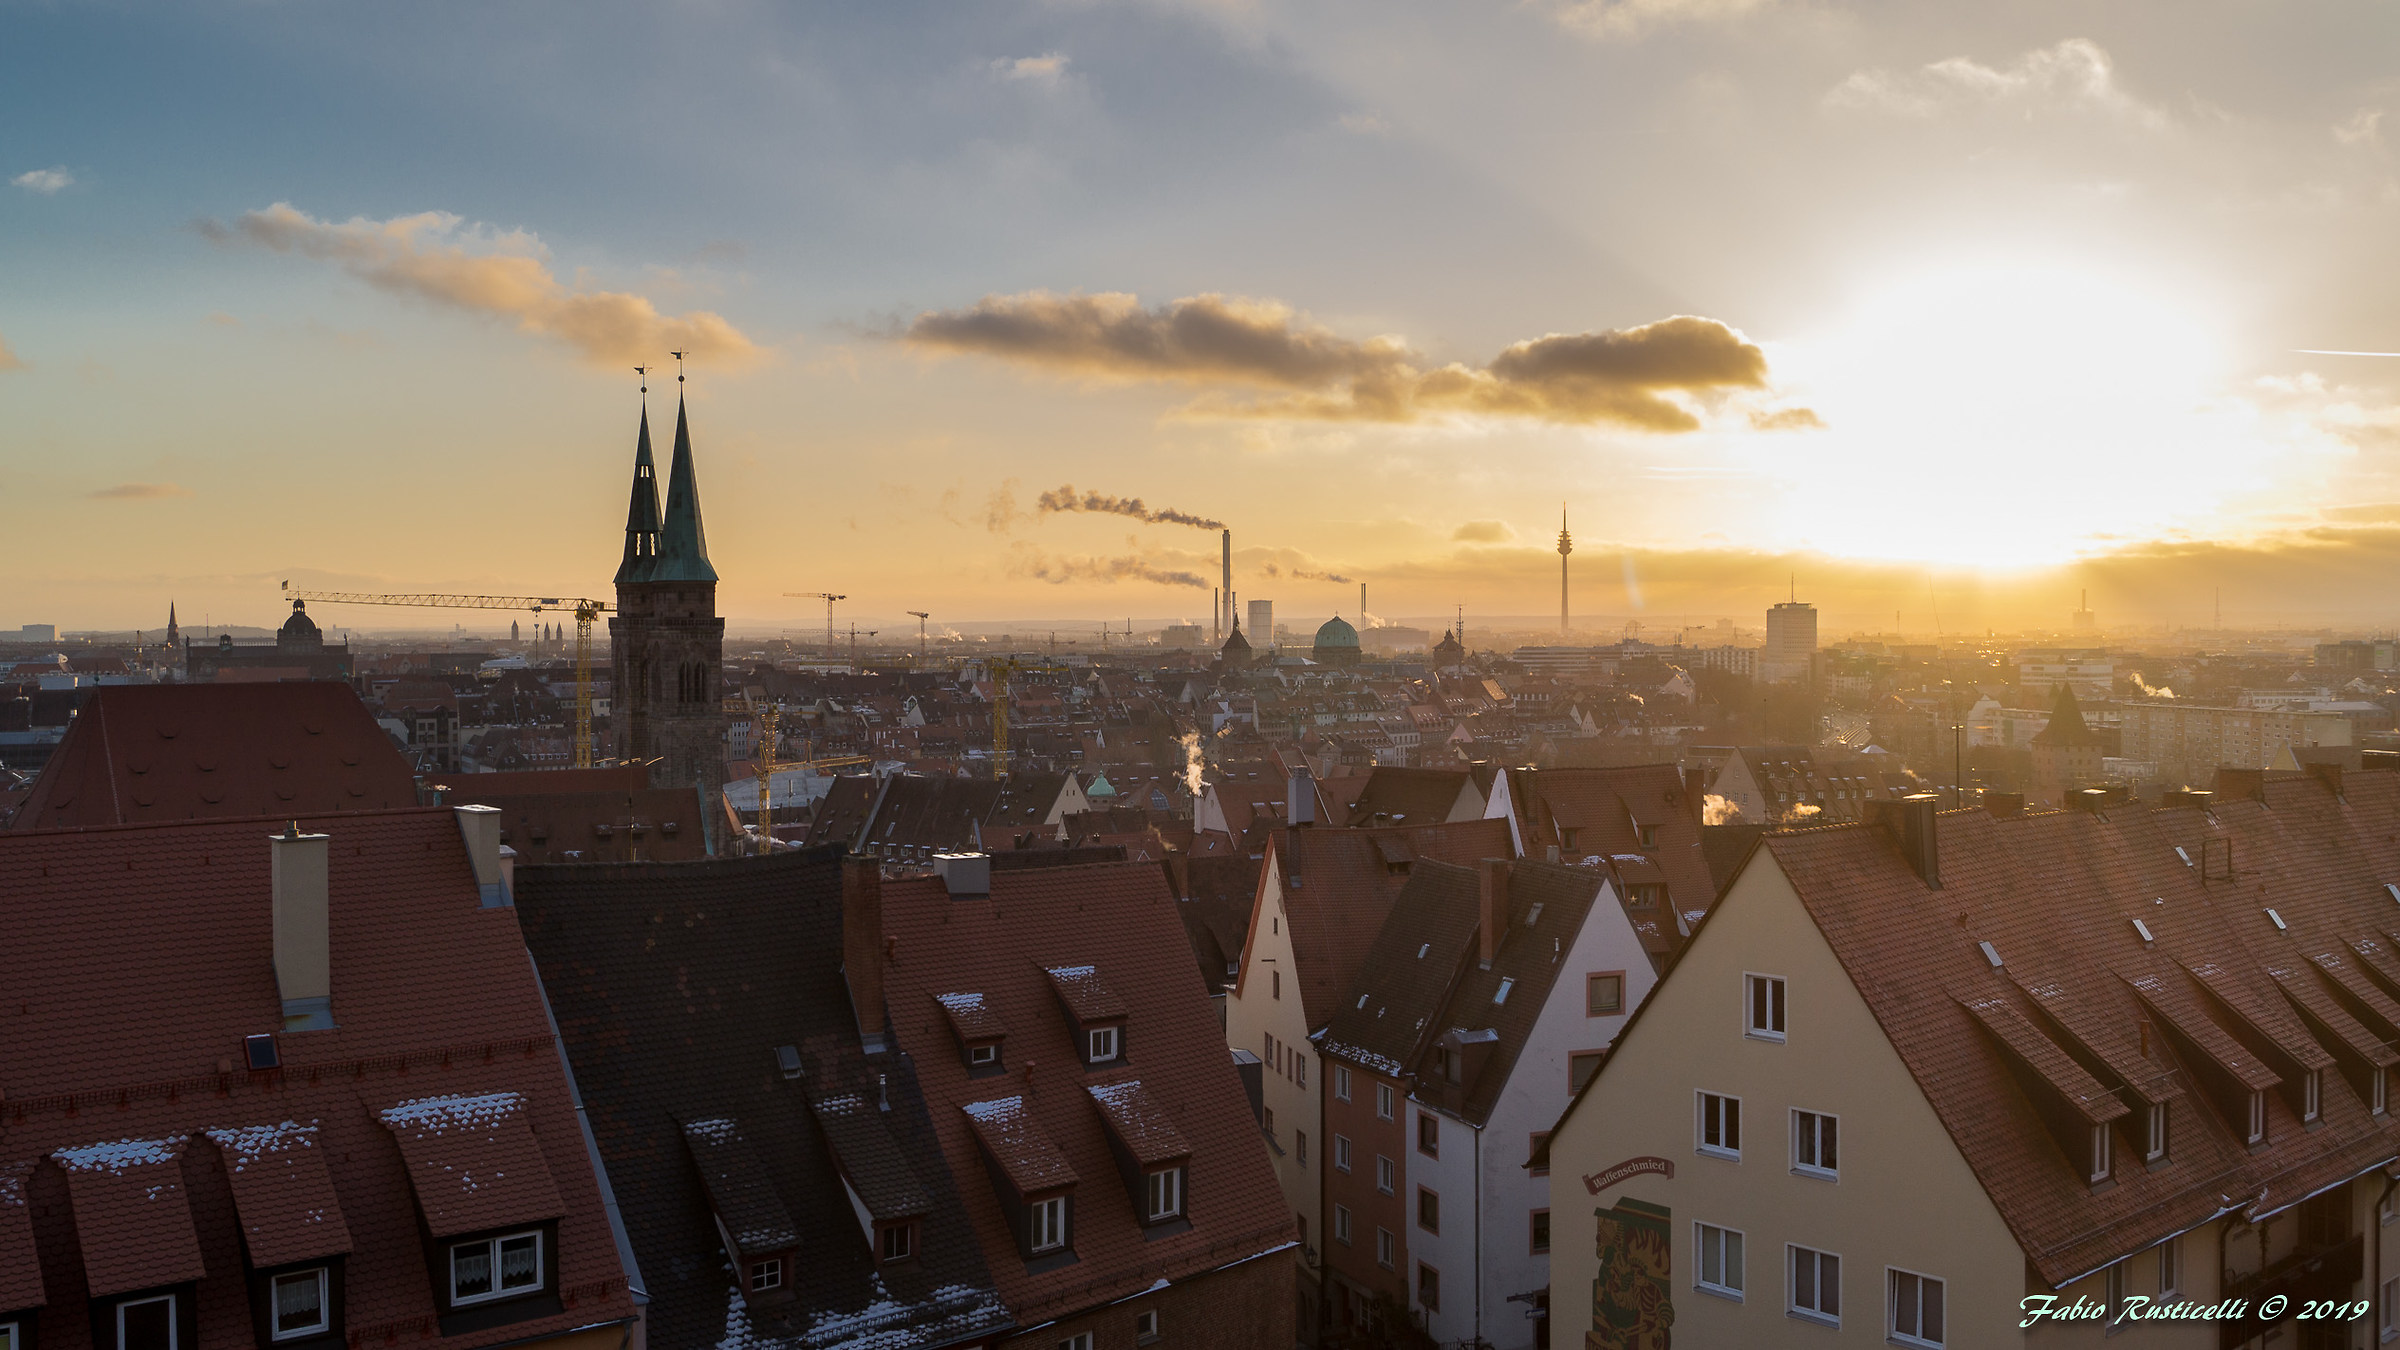 Winter Sunset in Nuremberg...